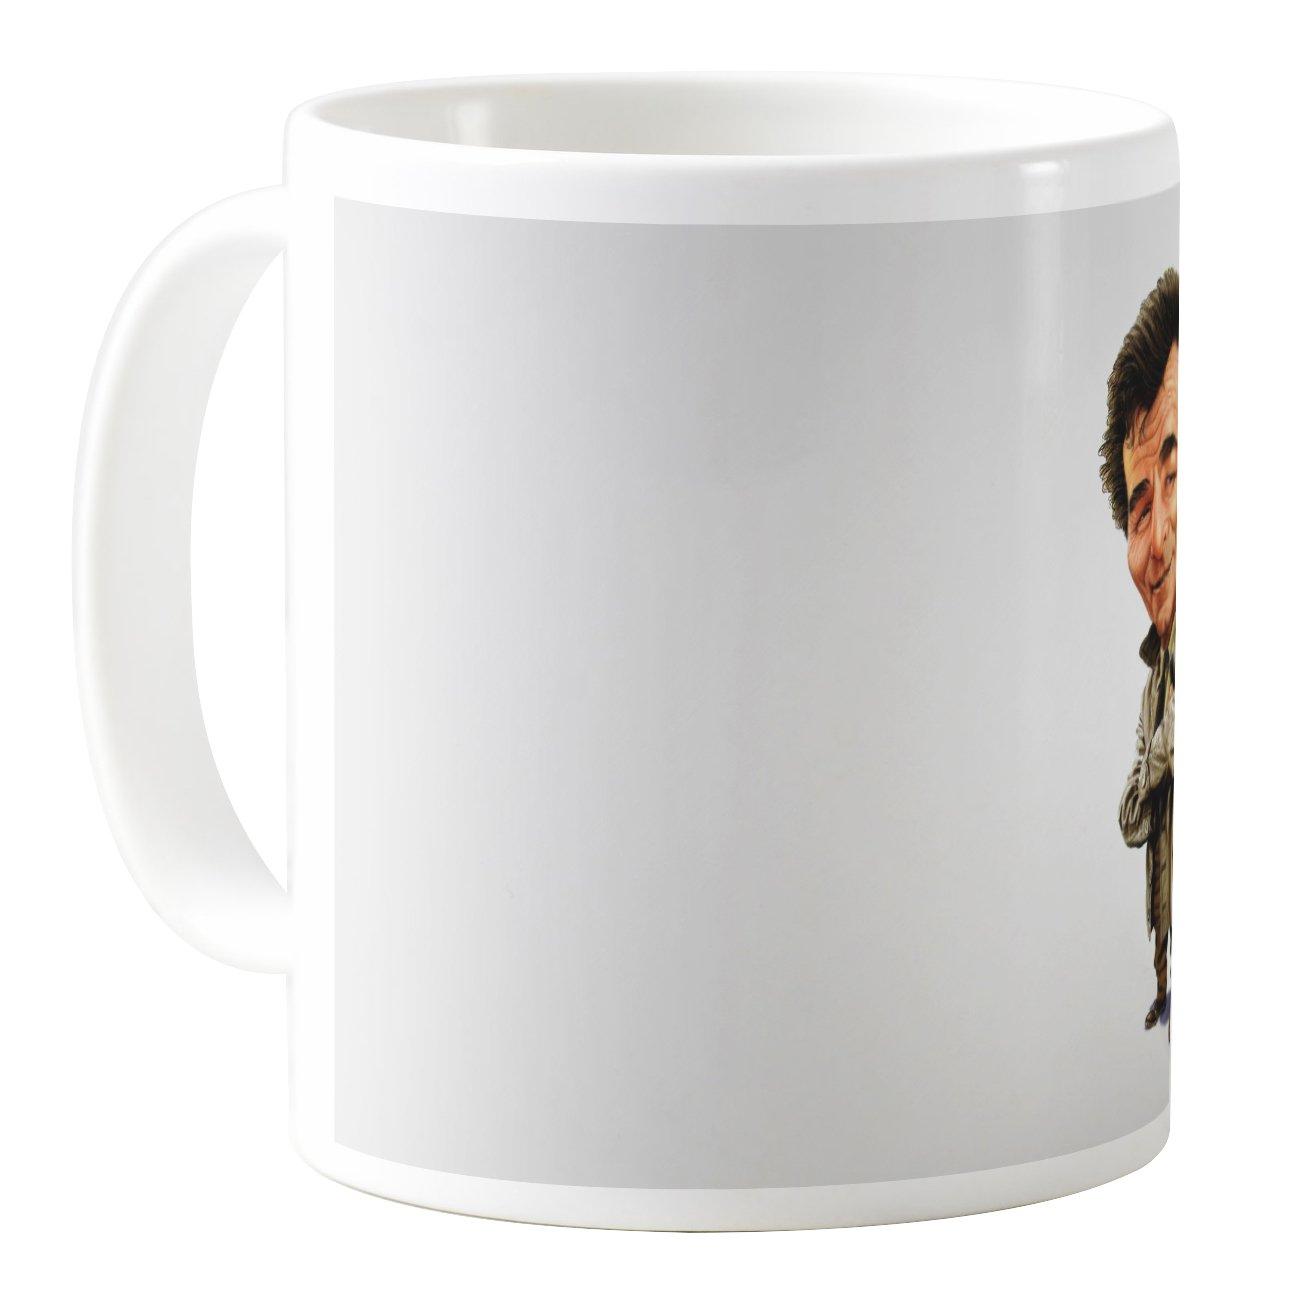 aquacafemug – cmstl-a12808 – 11オンスセラミックコーヒーマグティーカップ B074L6BLLZ